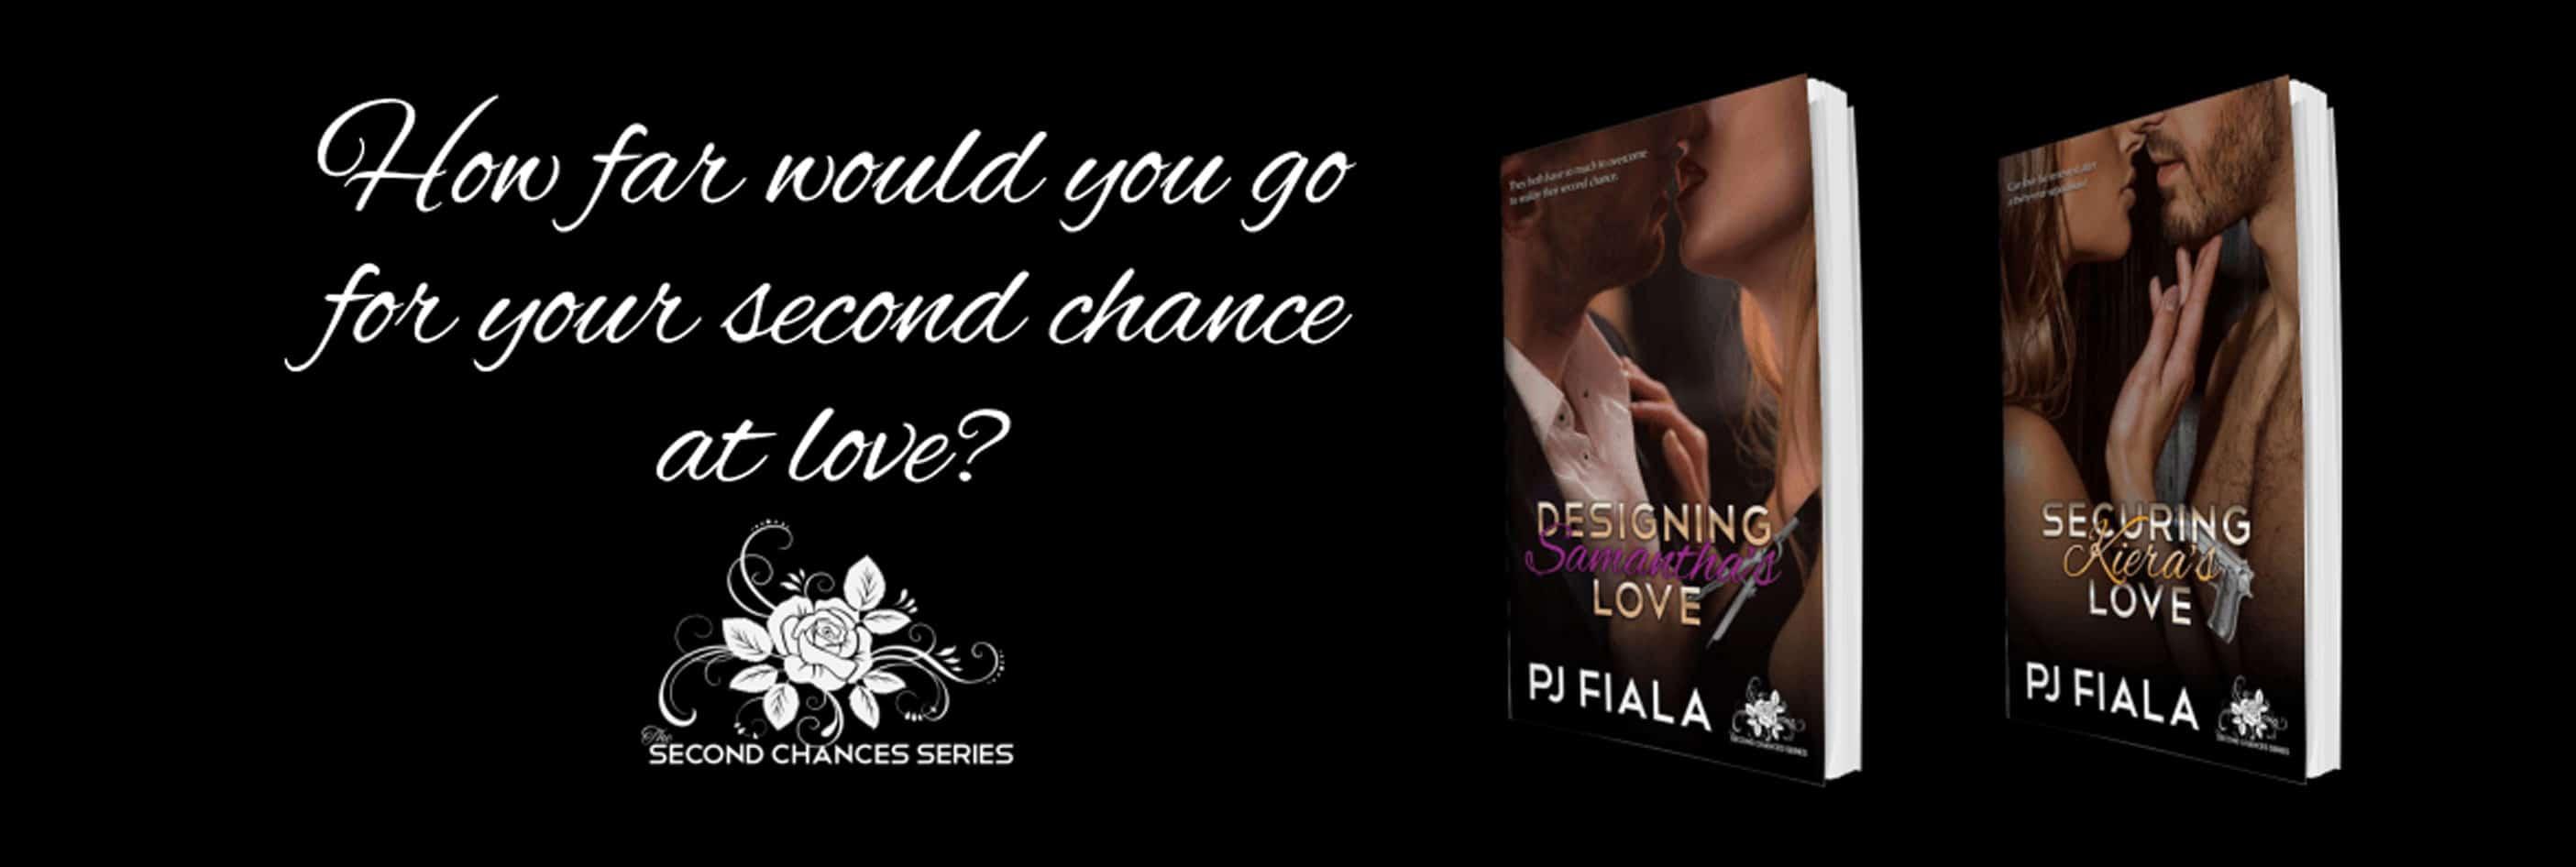 Second Chances, by Romance Author PJ Fiala